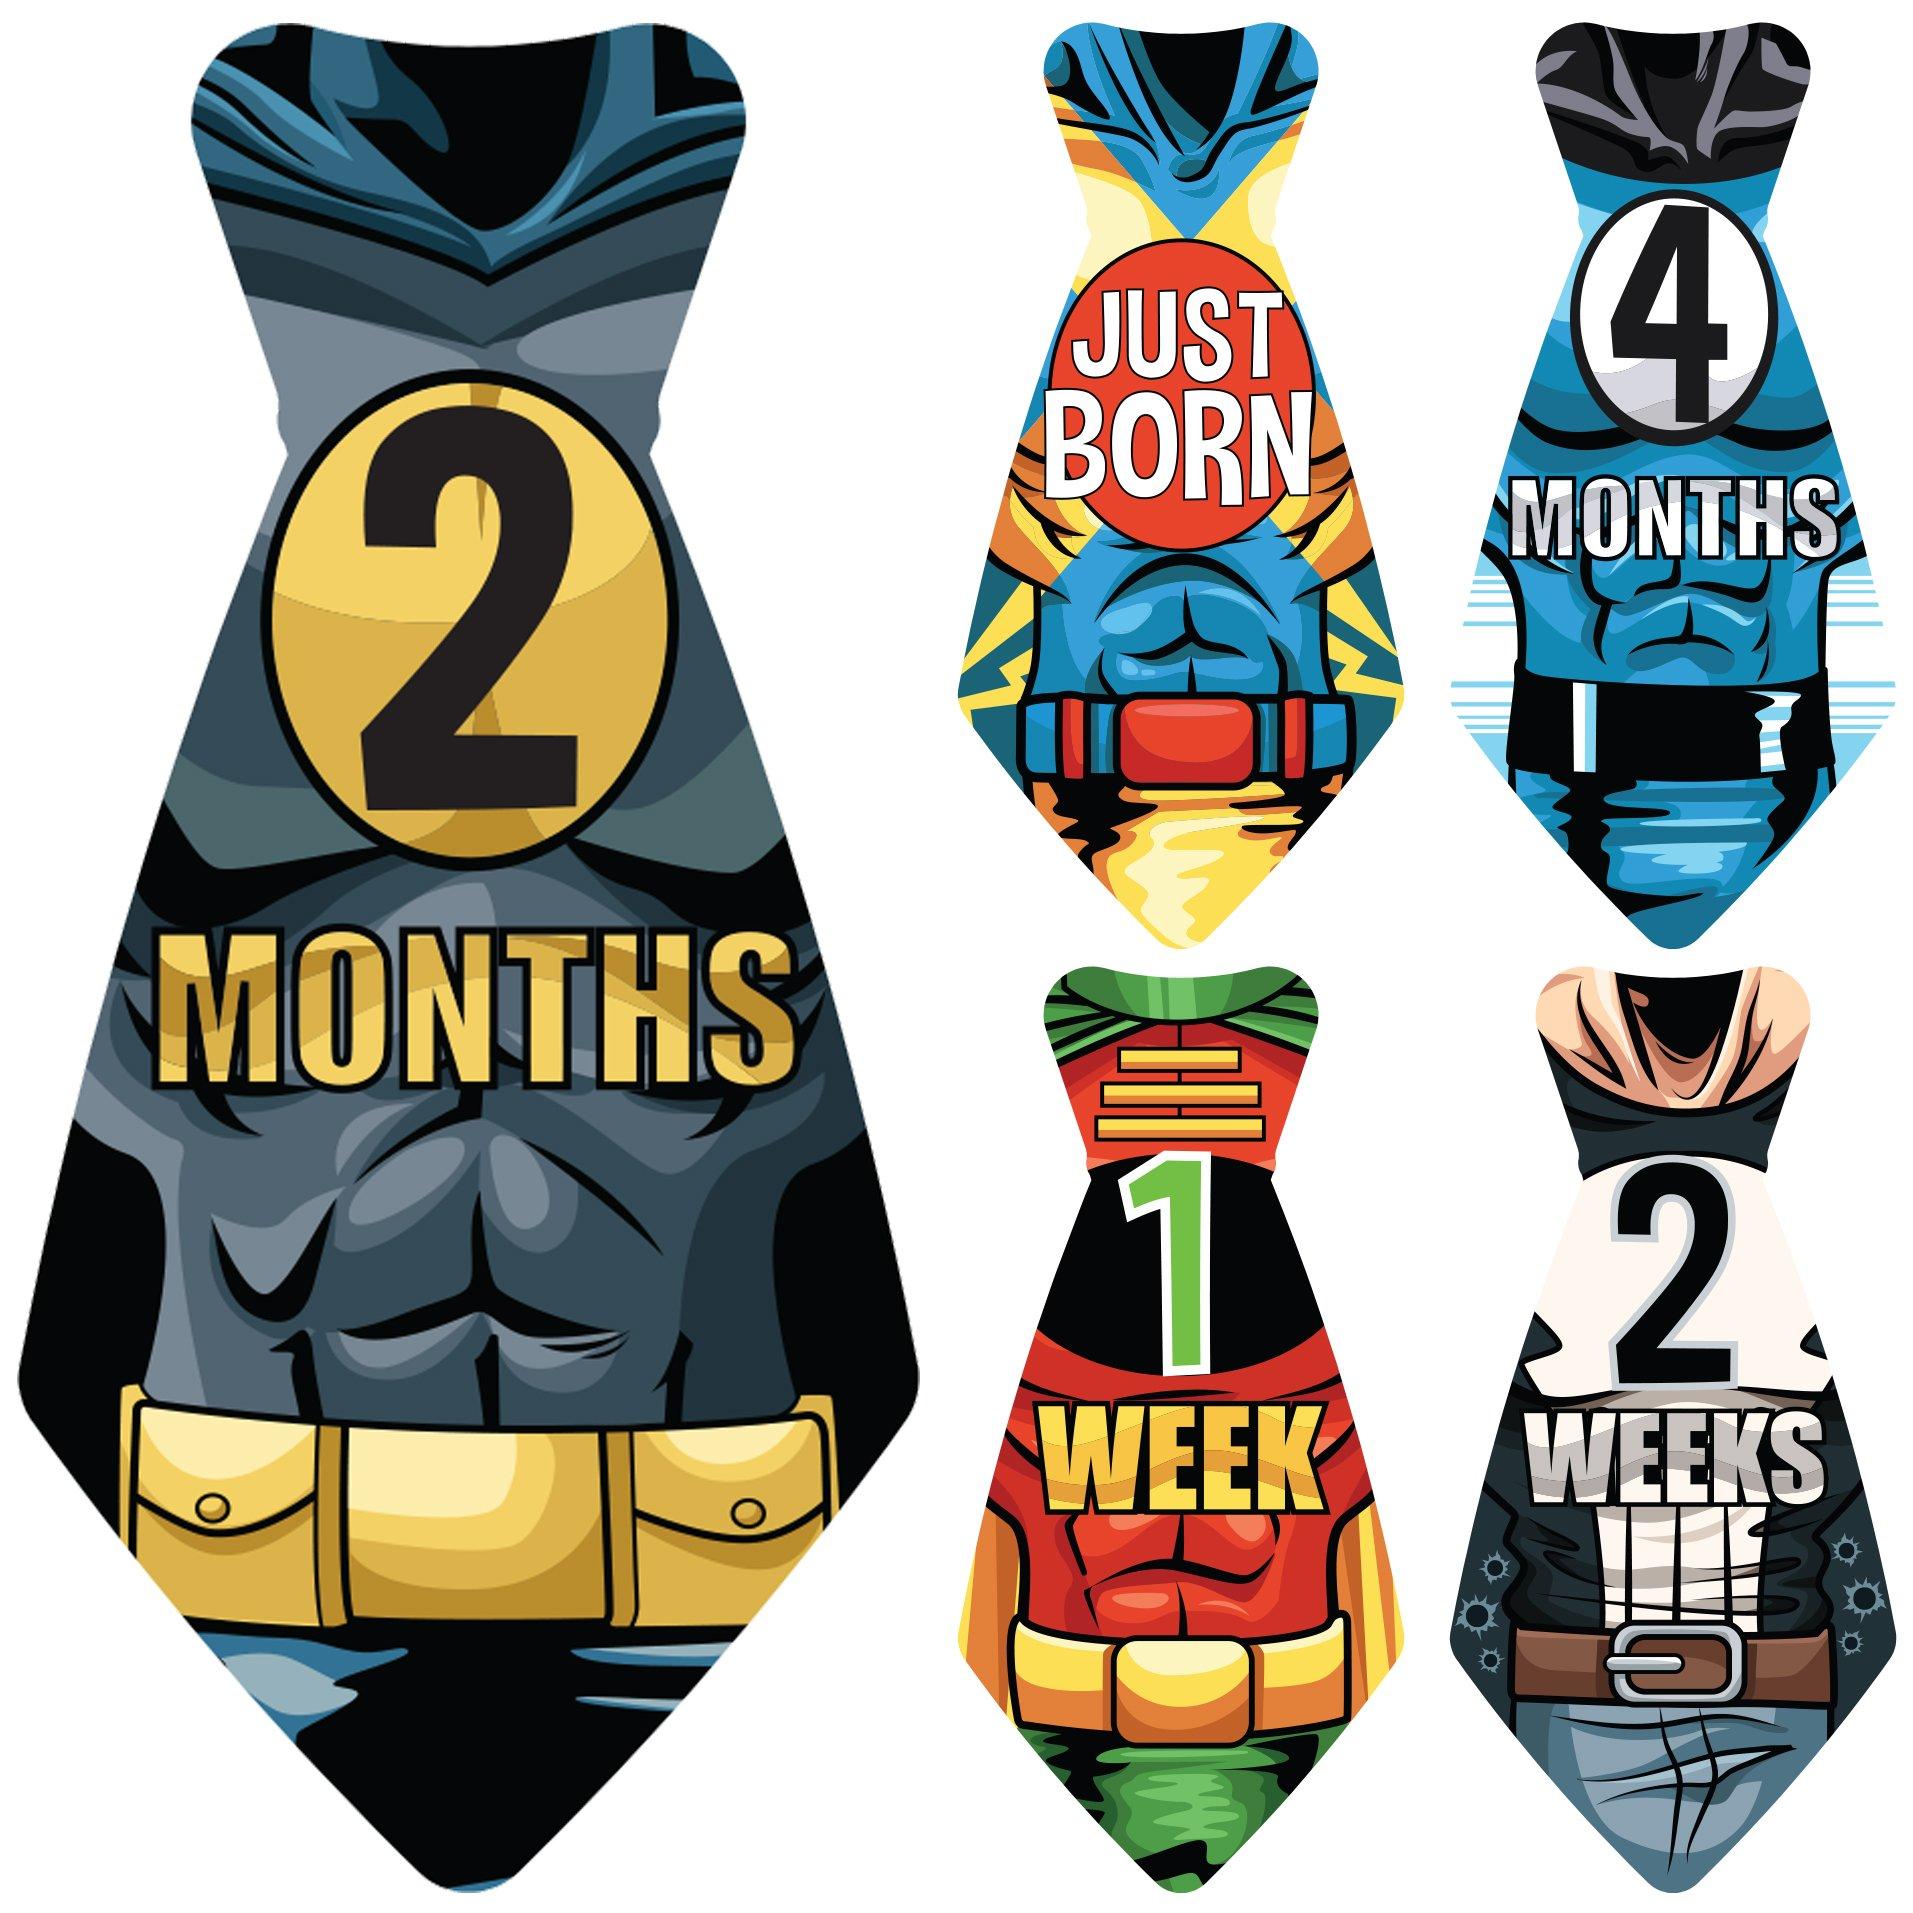 Original Stick'Nsnap (TM) 17 Baby Monthly Necktie Onesie Stickers -''Happy Heroes'' (TM) Milestones for 12 Months +5 Bonus Milestones - Great Baby Shower Gift by Stick'Nsnap